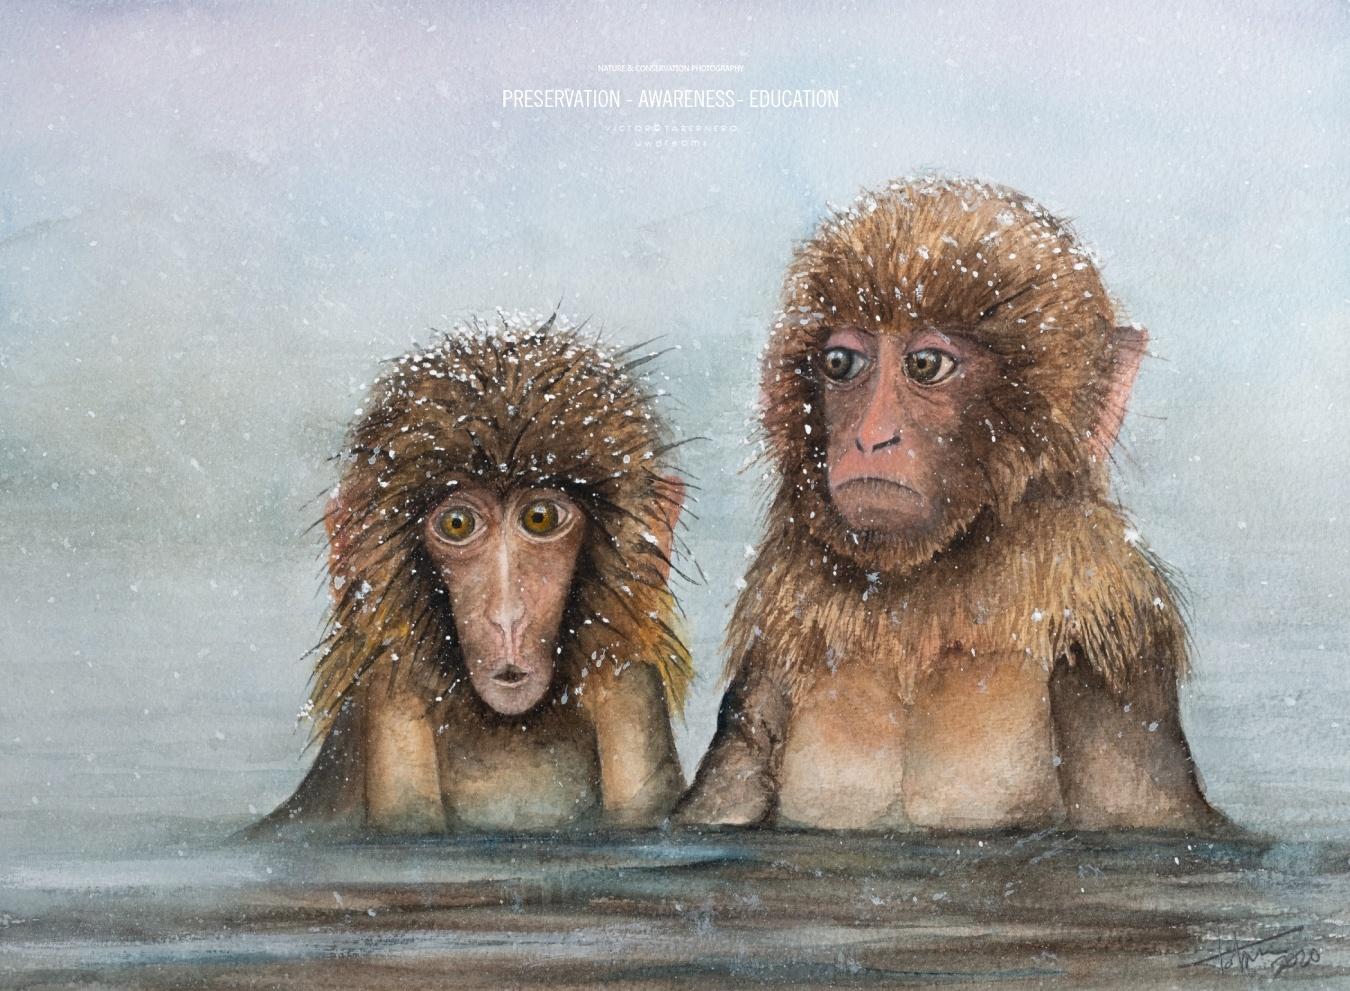 Monos japoneses - 41x31cm - Vida Salvaje - Wildlife Conservation Photography, UWDREAMS.COM